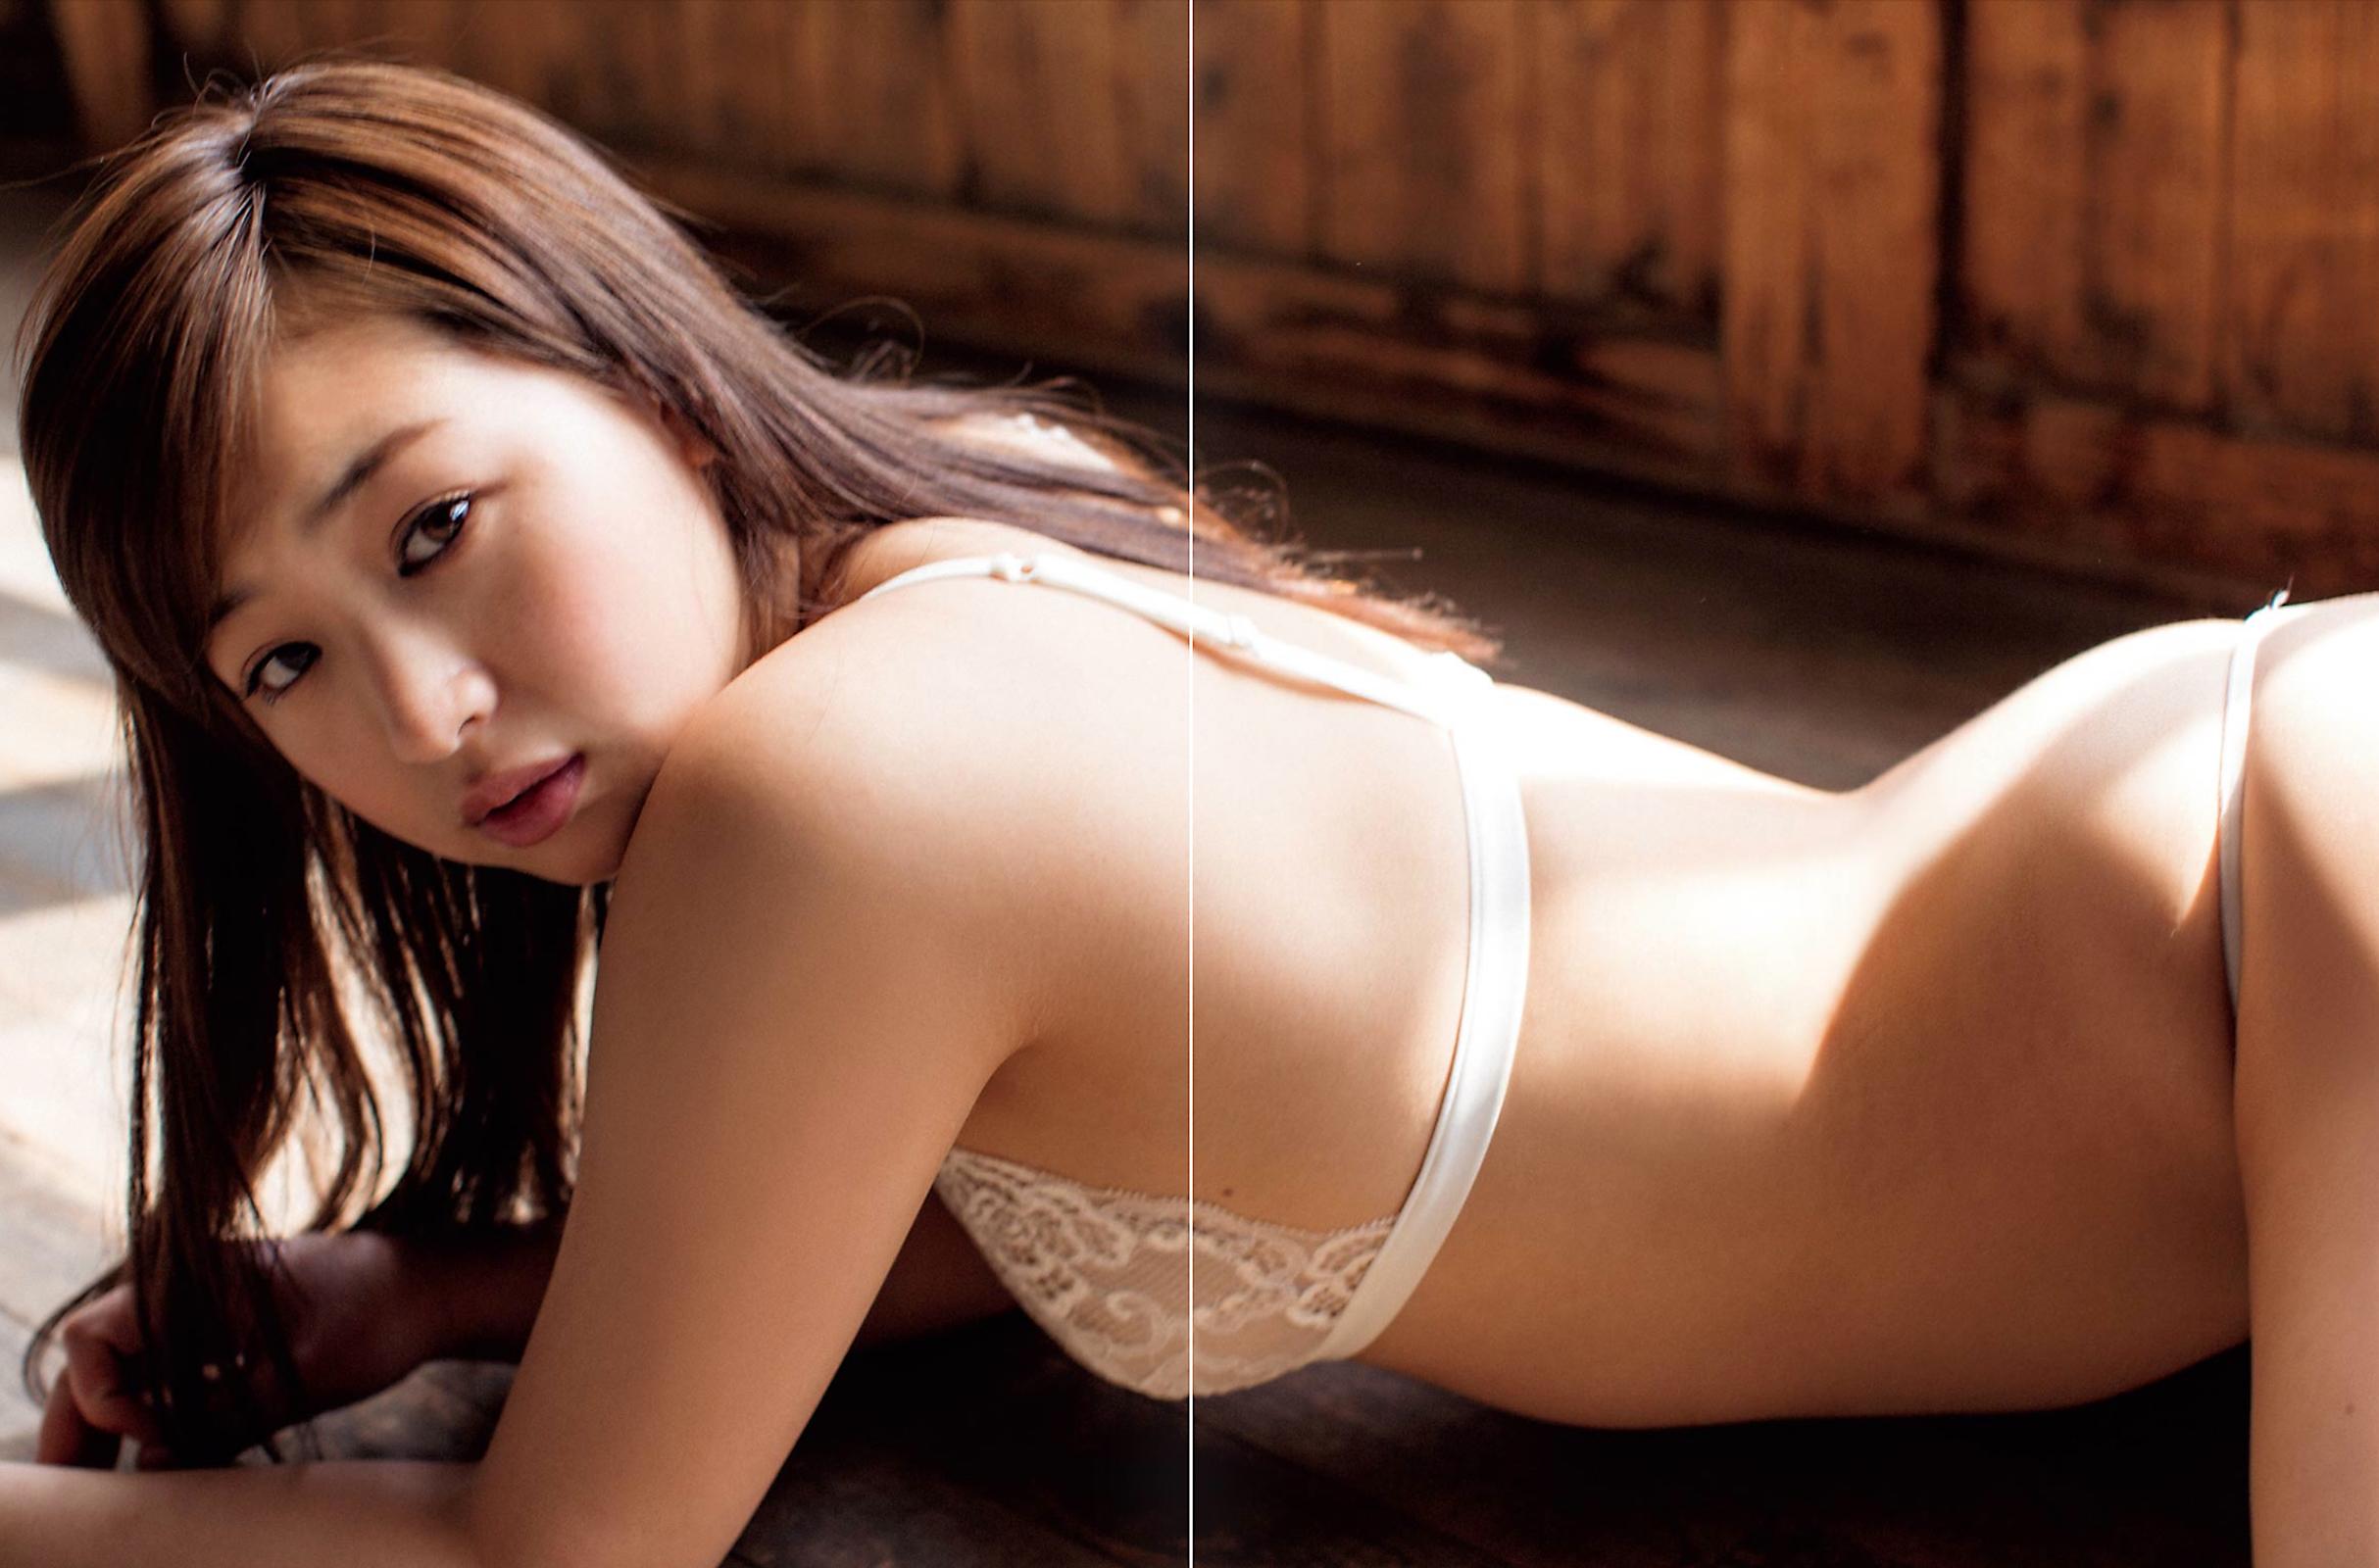 image http://scanlover.com/assets/images/4875-XMtpGawcQkWPp2IQ.jpeg